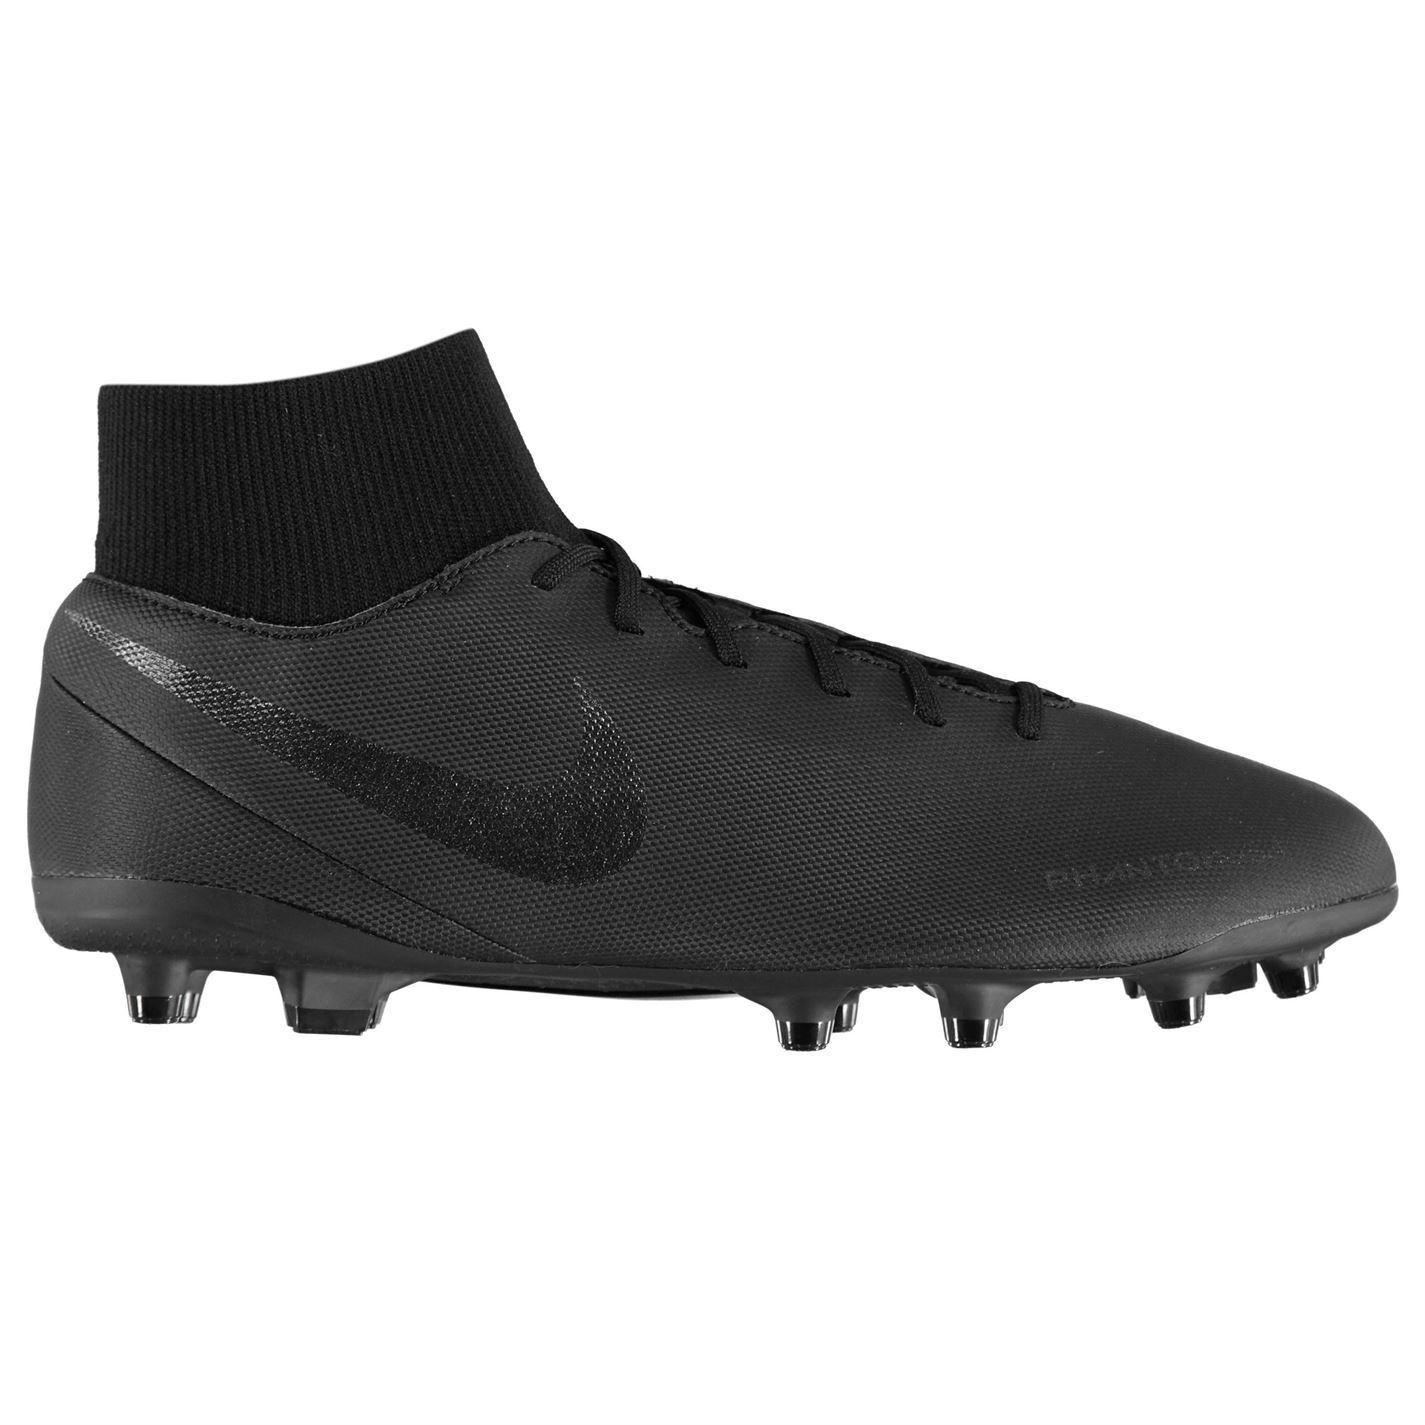 803c83e8d27 ... Nike Phantom Vision Club DF Firm Ground Football Boots Mens Soccer  Shoes Cleats